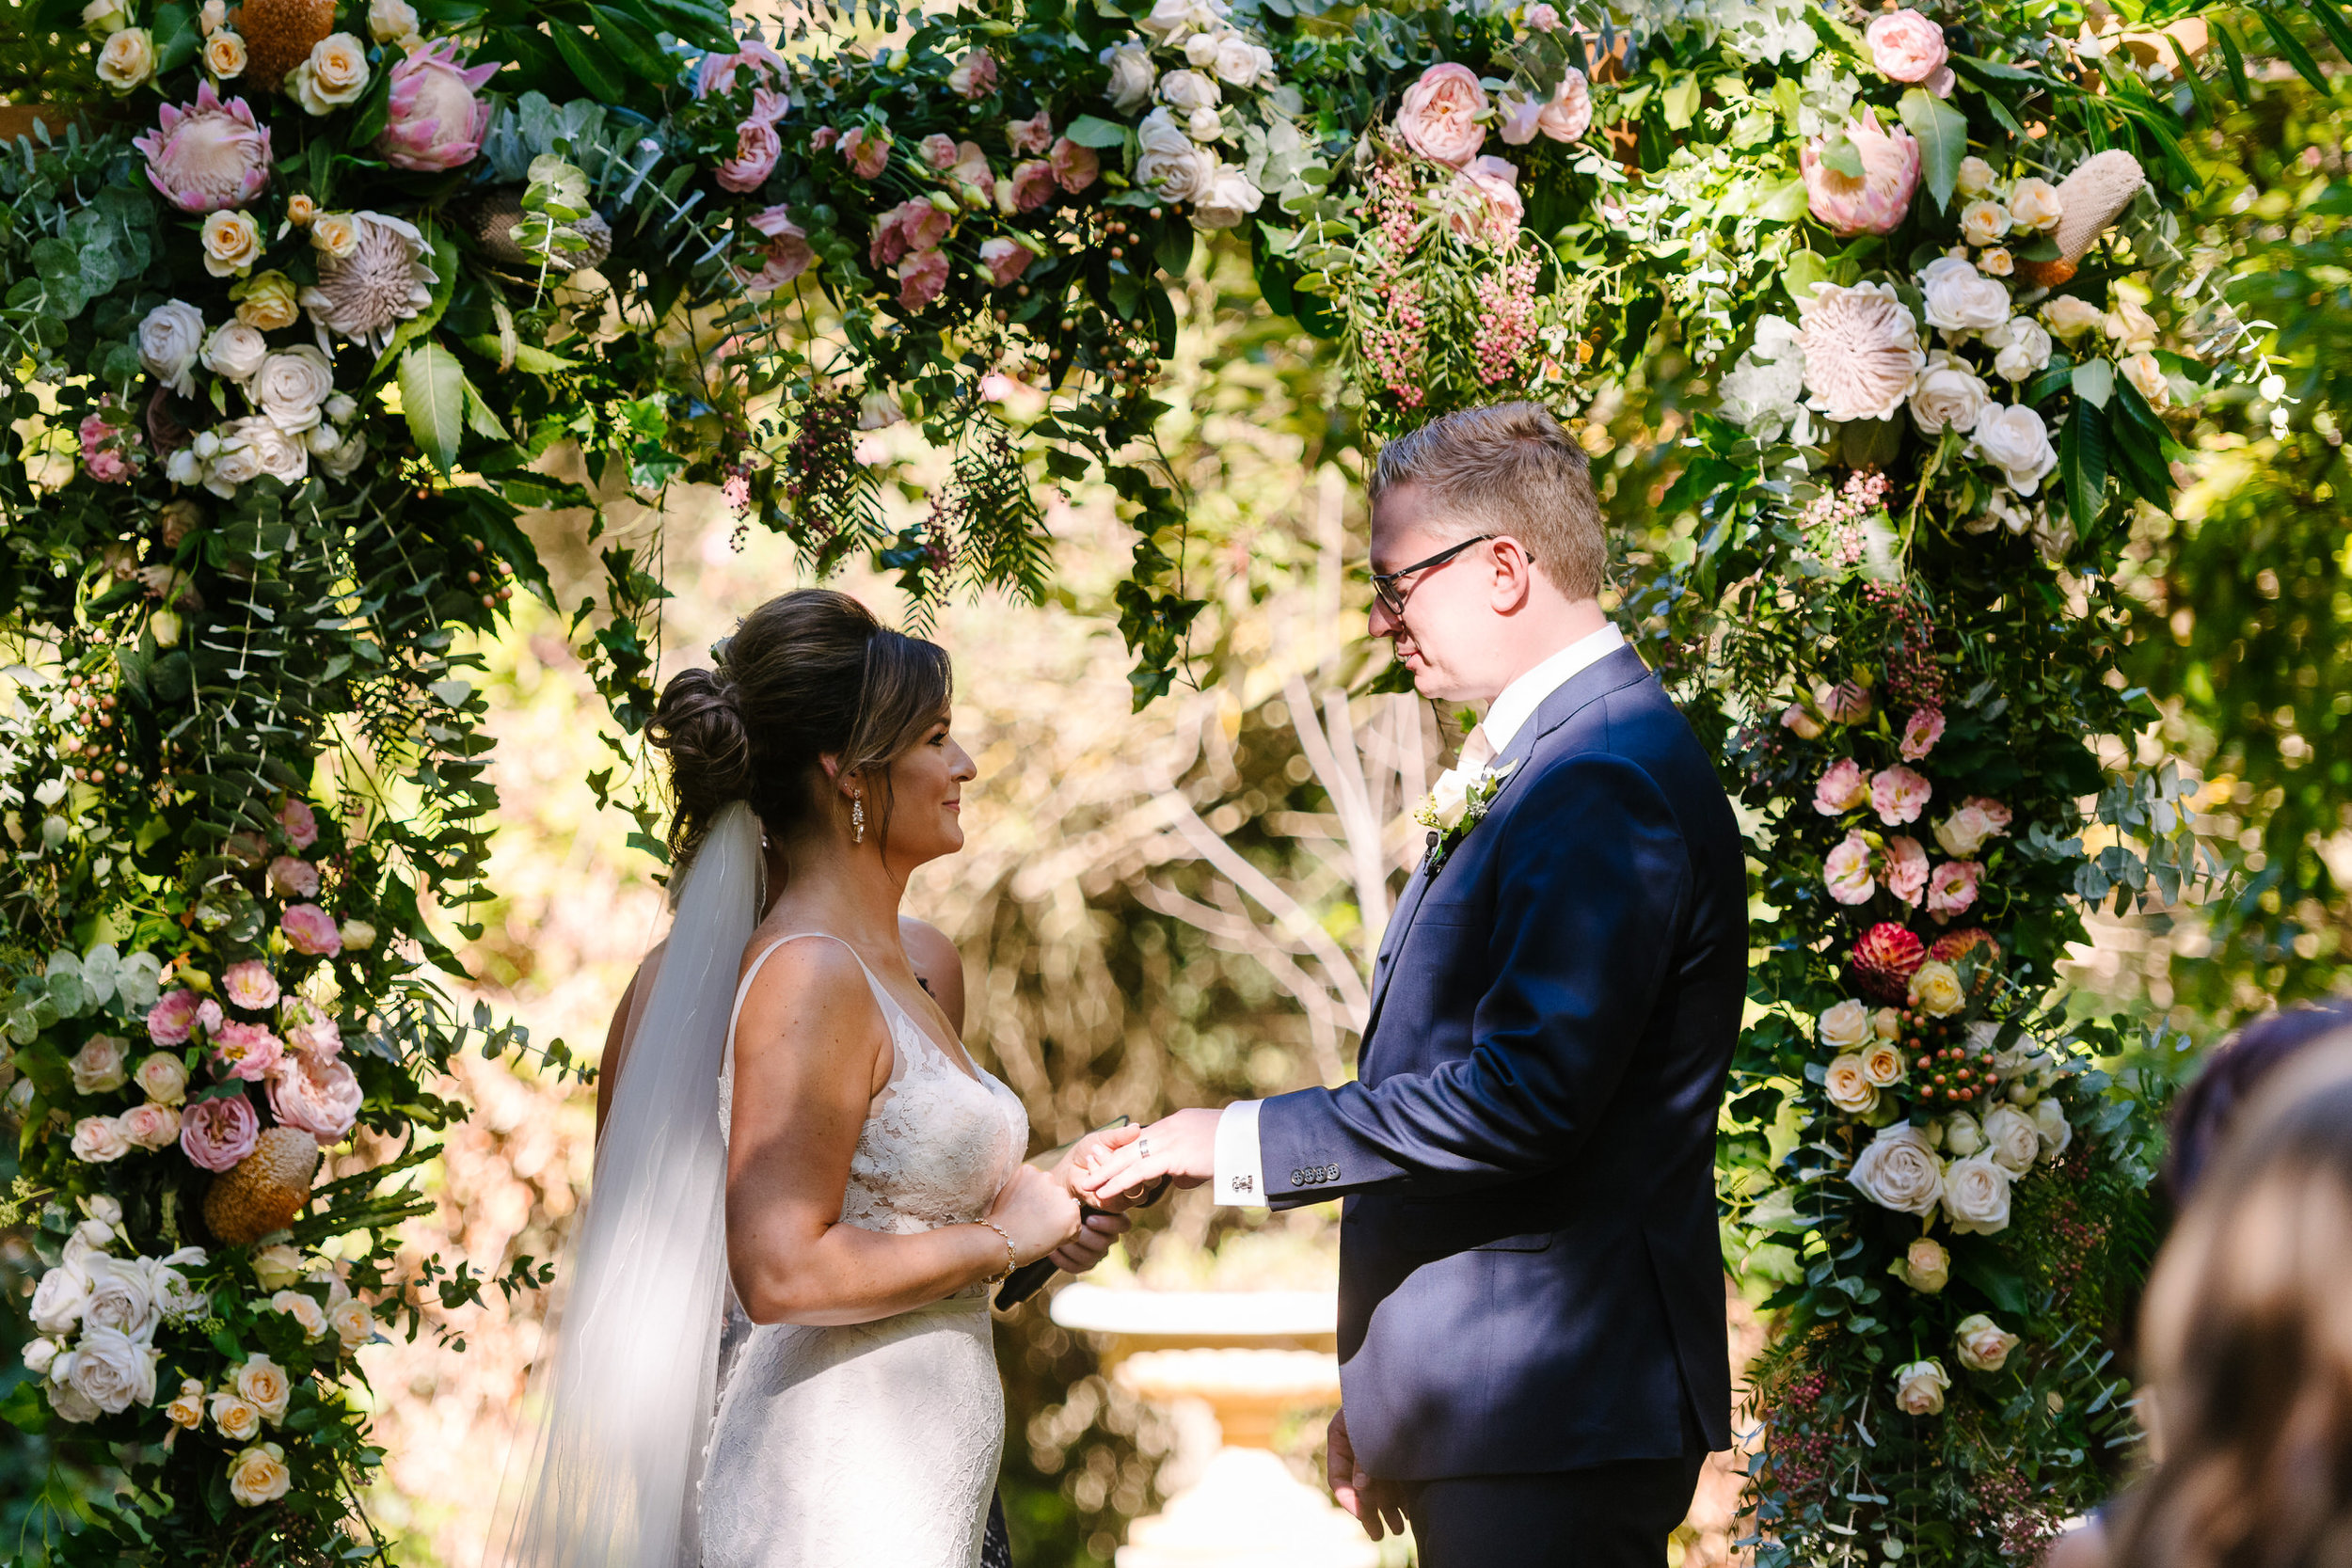 Justin_And_Jim_Photography_Chateau_Dore_Bendigo_Wedding41.JPG